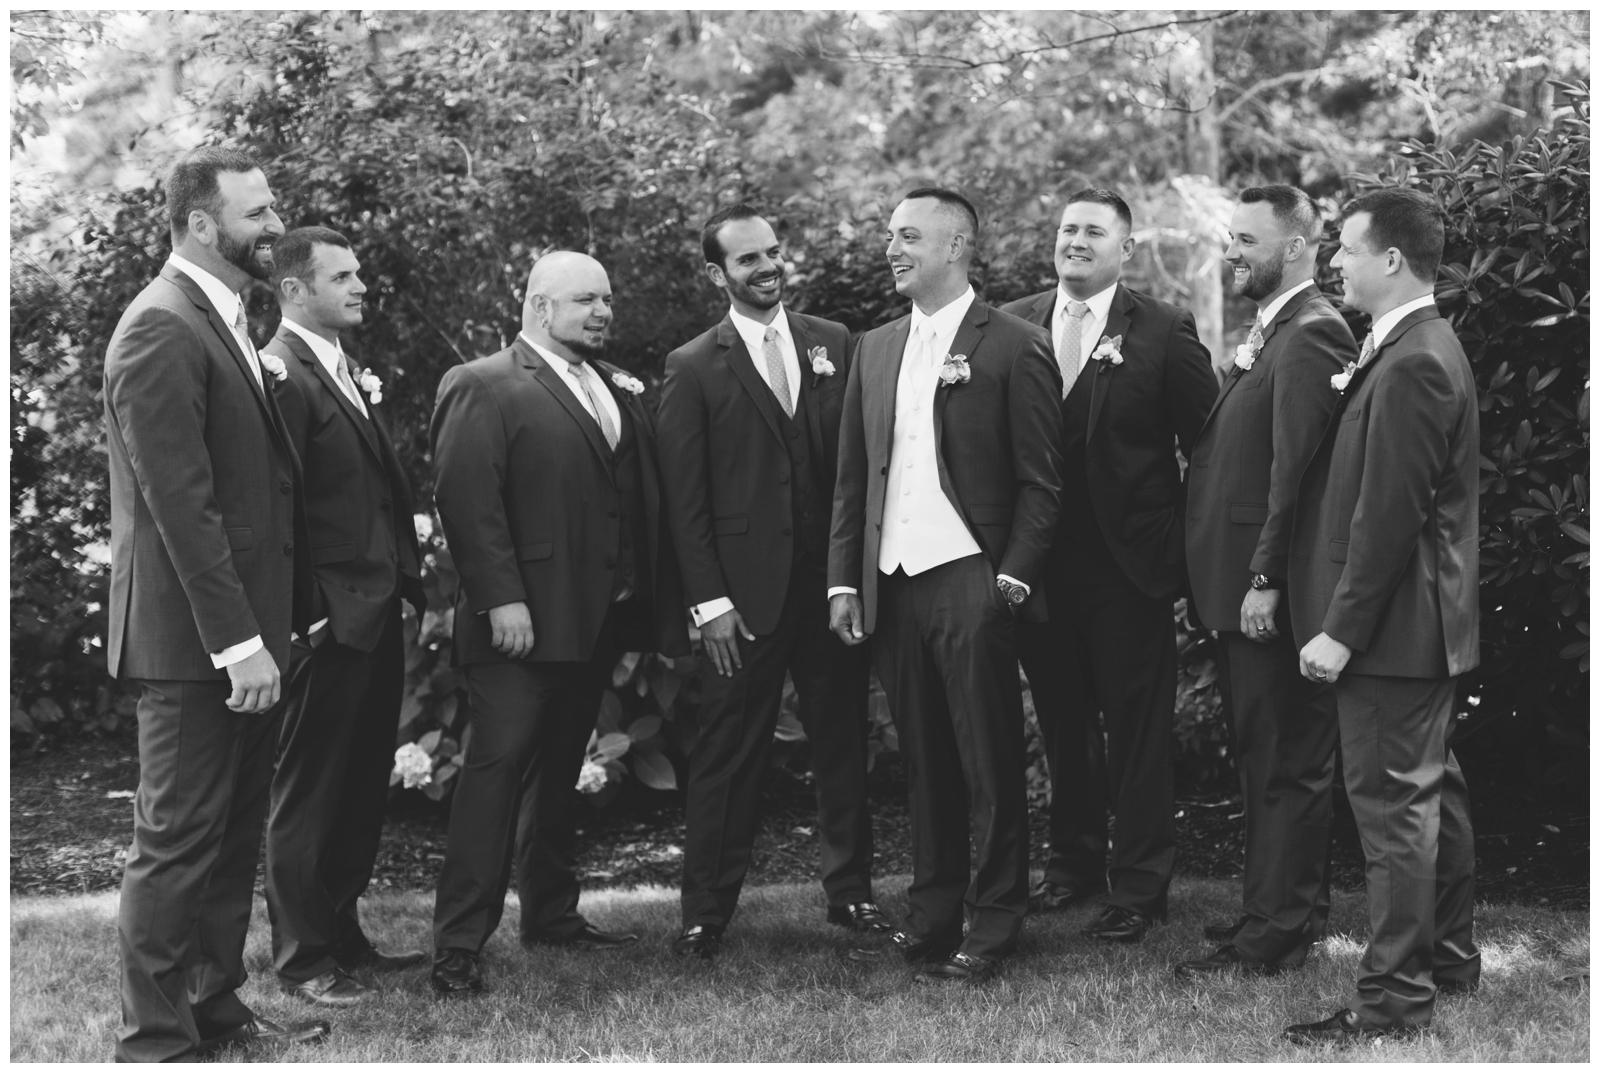 Bailey-Q-Photo-Pine-Hills-Pavilion-Wedding-Boston-Wedding-Photographer-031.jpg